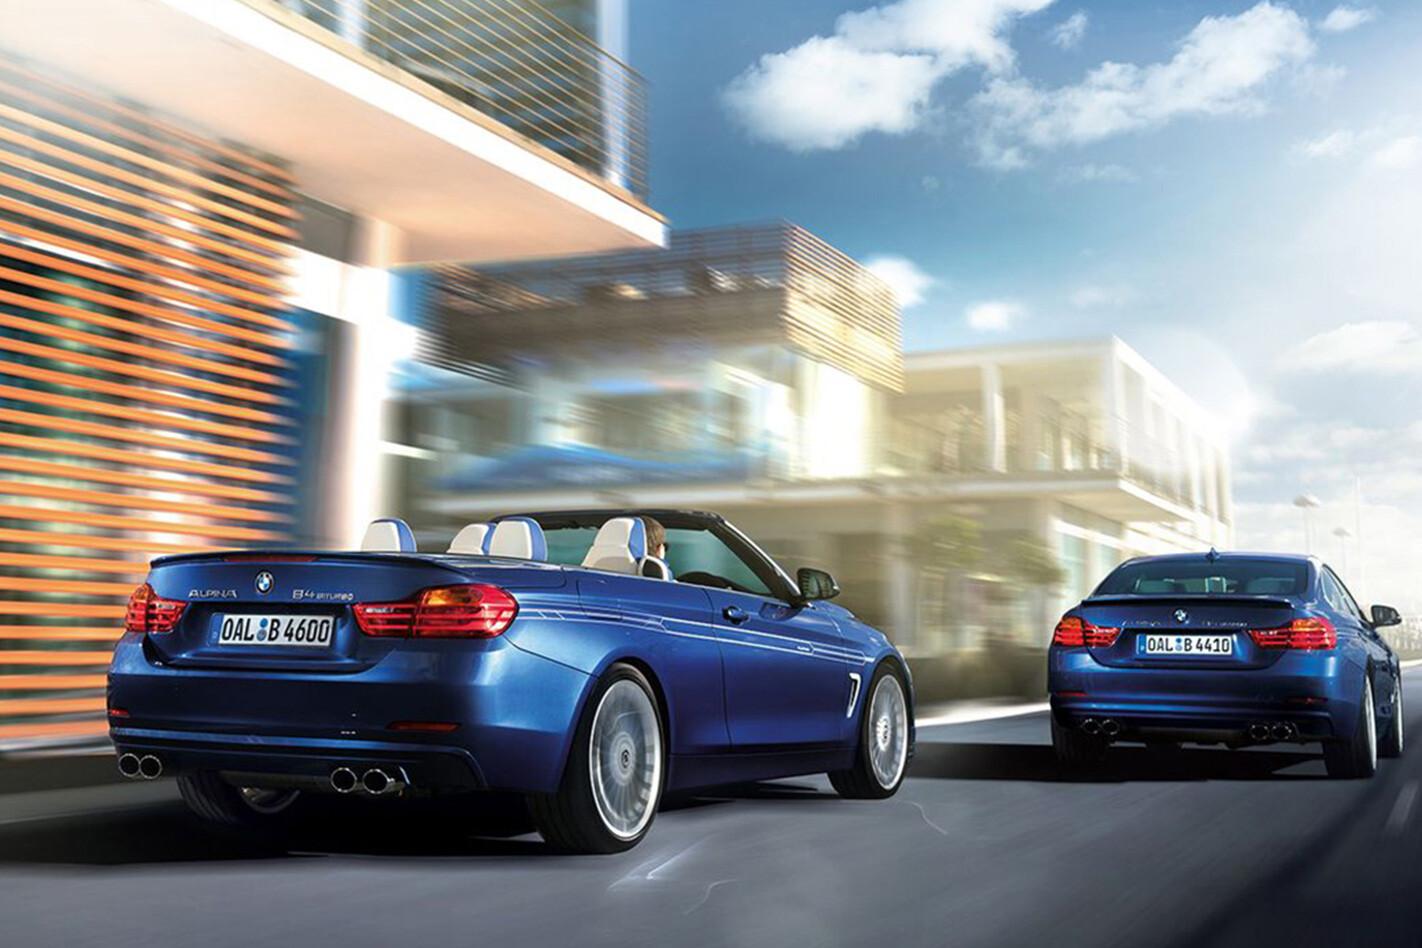 BMW-Alpina-B4-rear.jpg